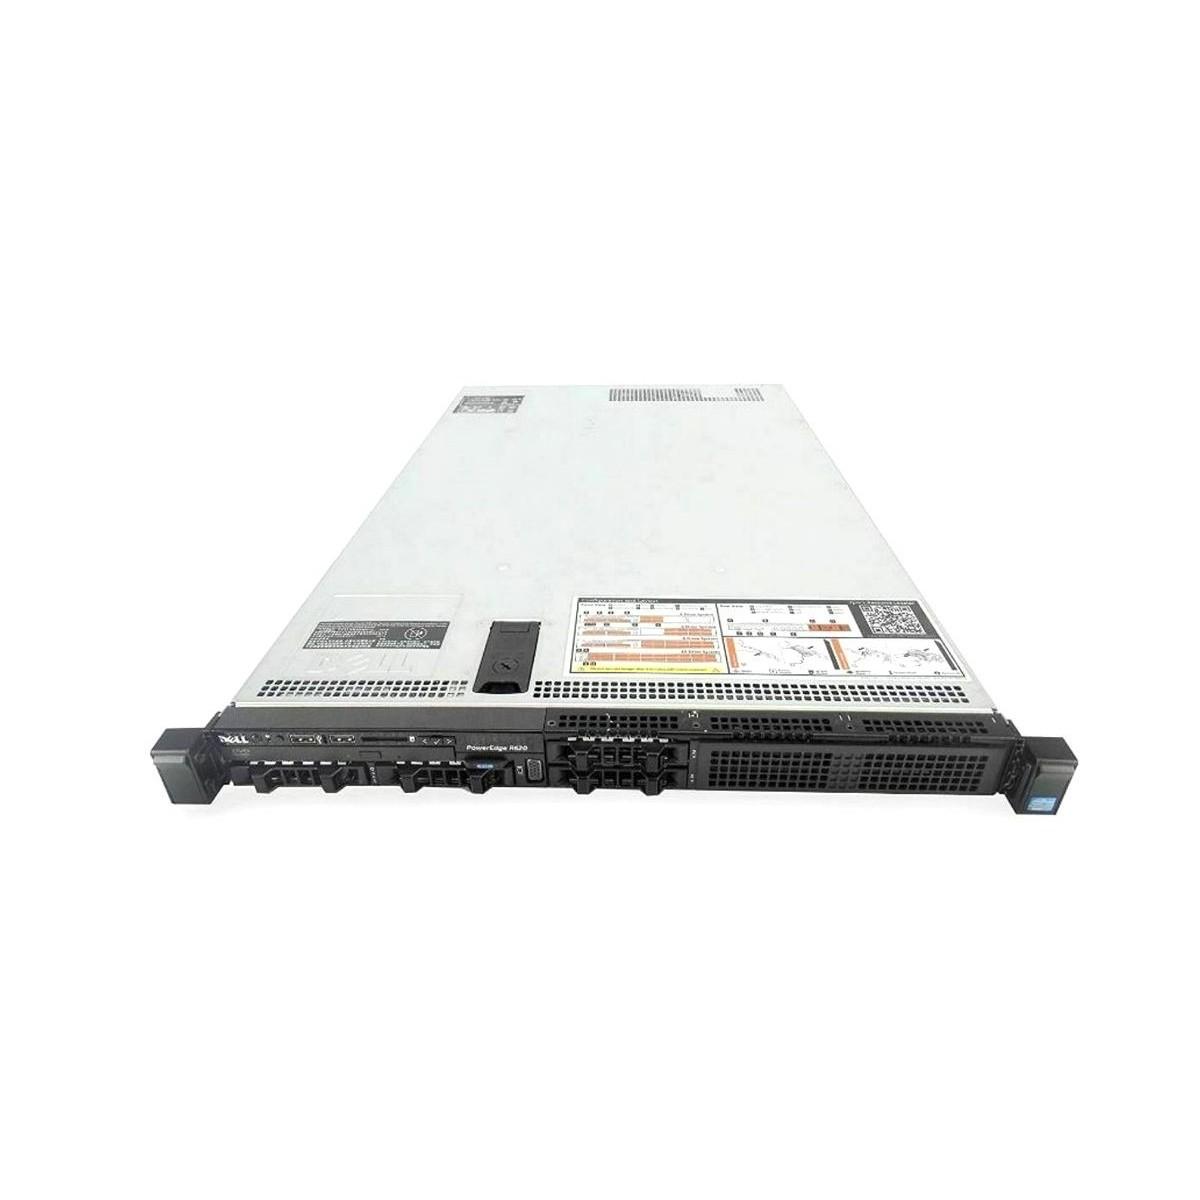 WIN2019 STD+DELL R620 2xE5 64GB 4x500GB SSD 2xPSU